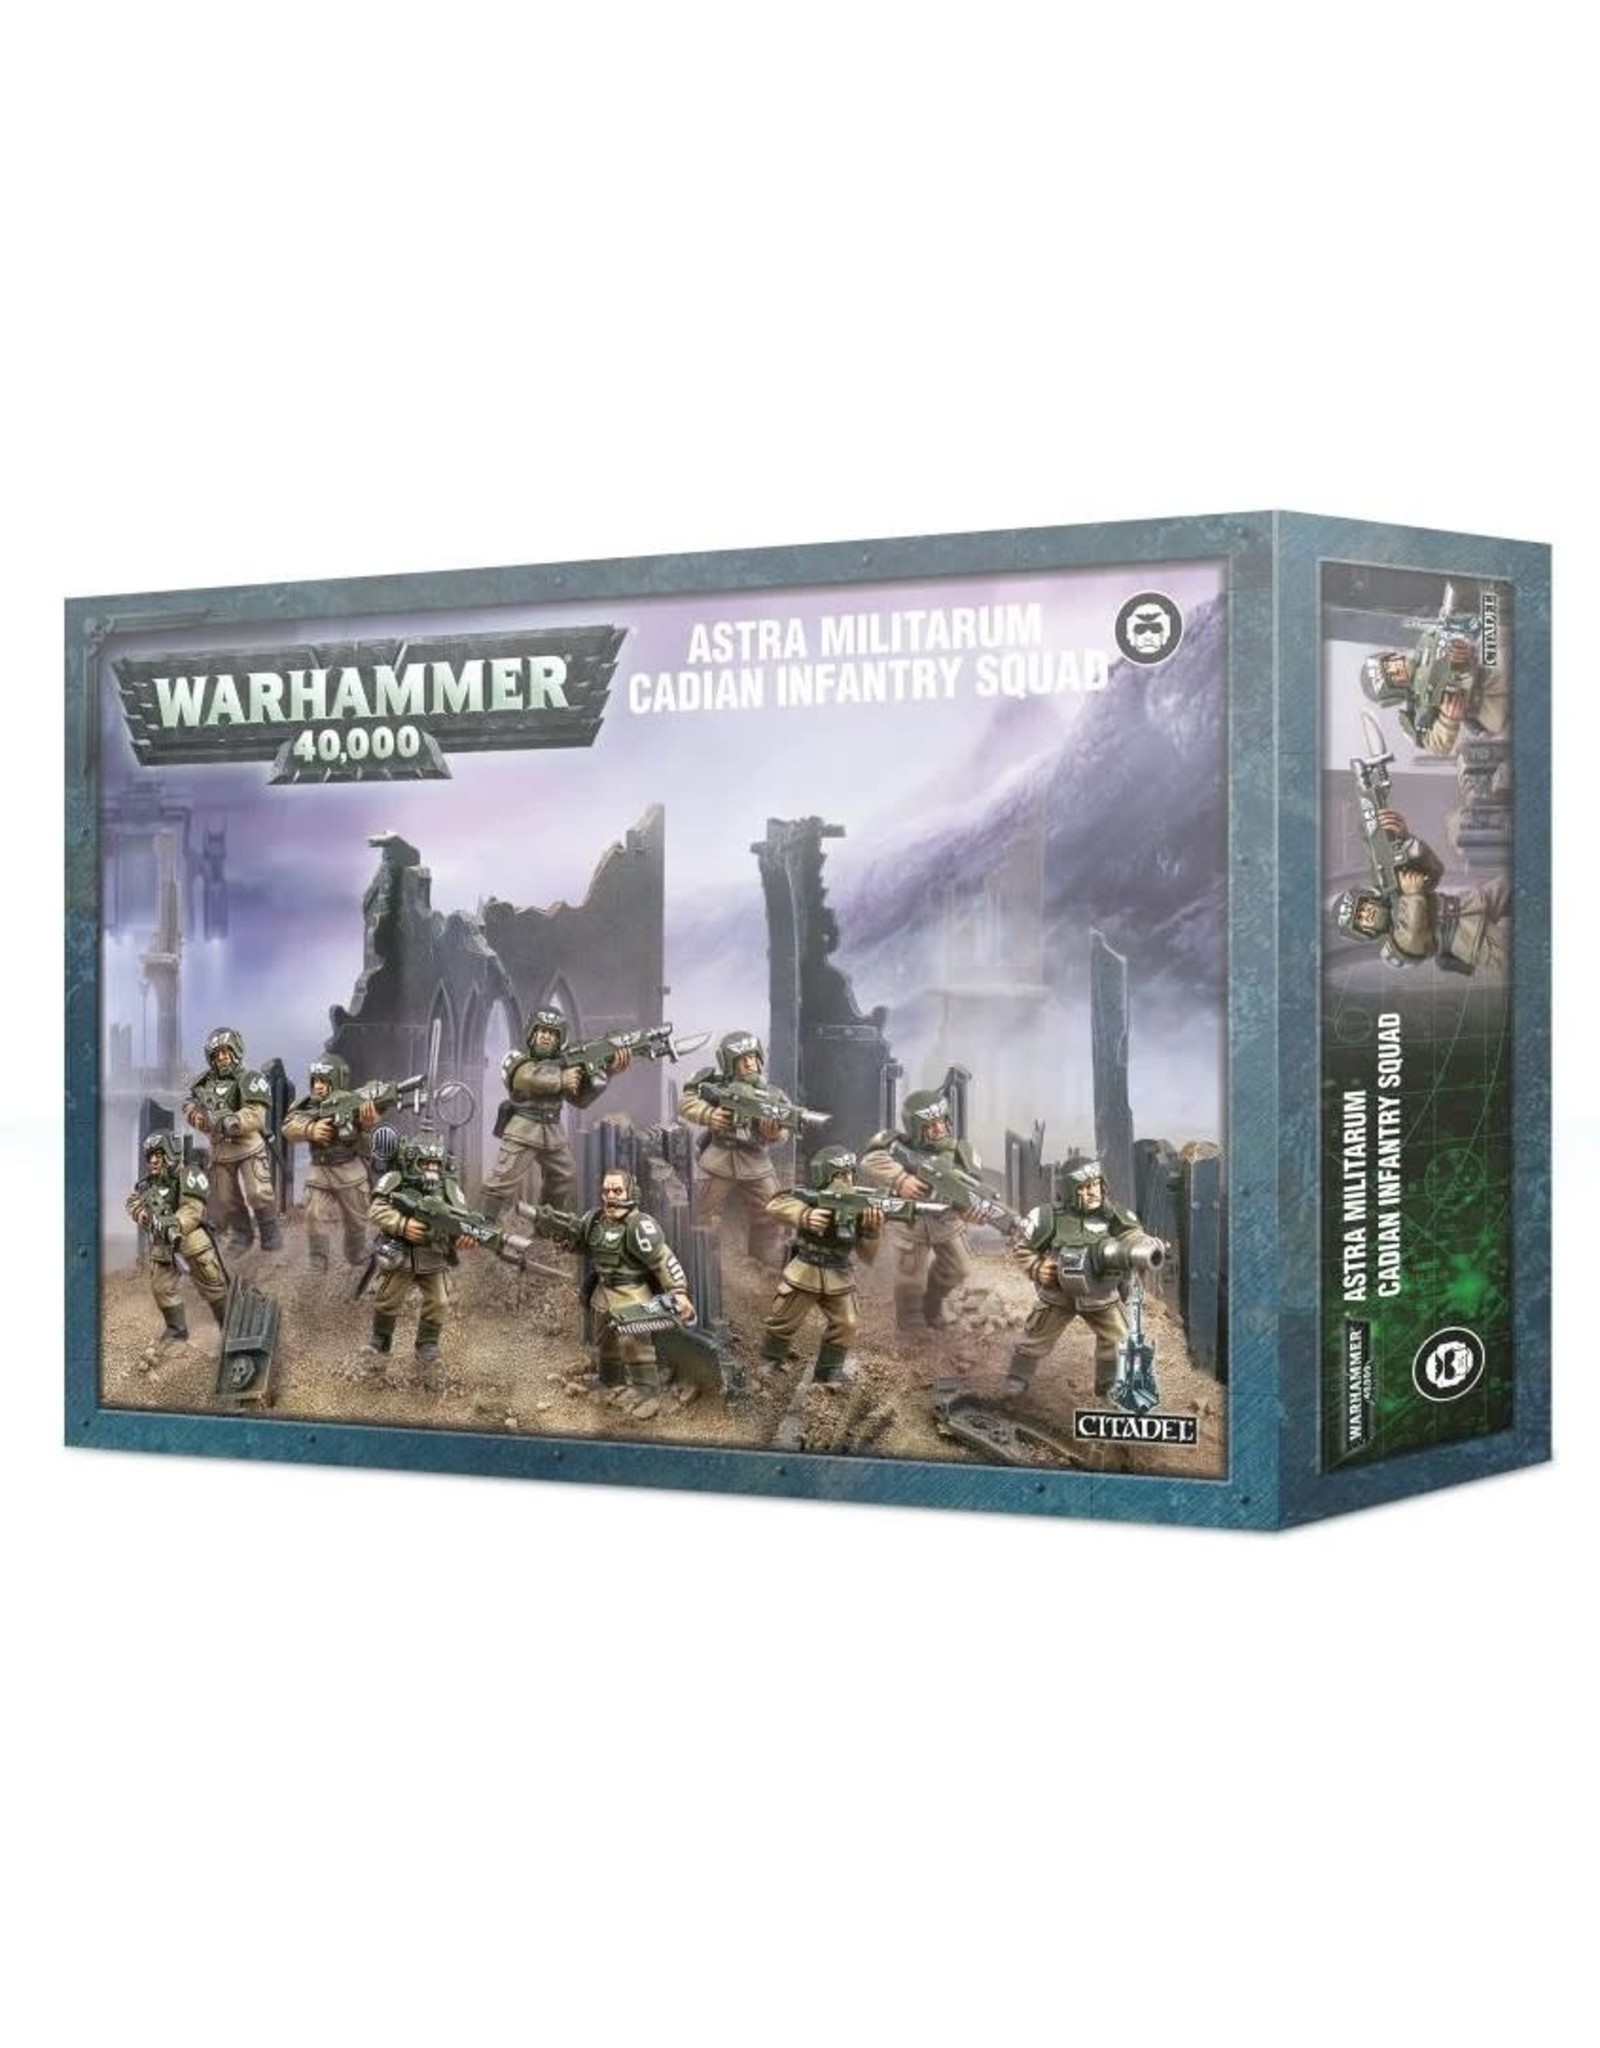 Warhammer 40K WH40K Astra Militarum Cadians Infantry Squad